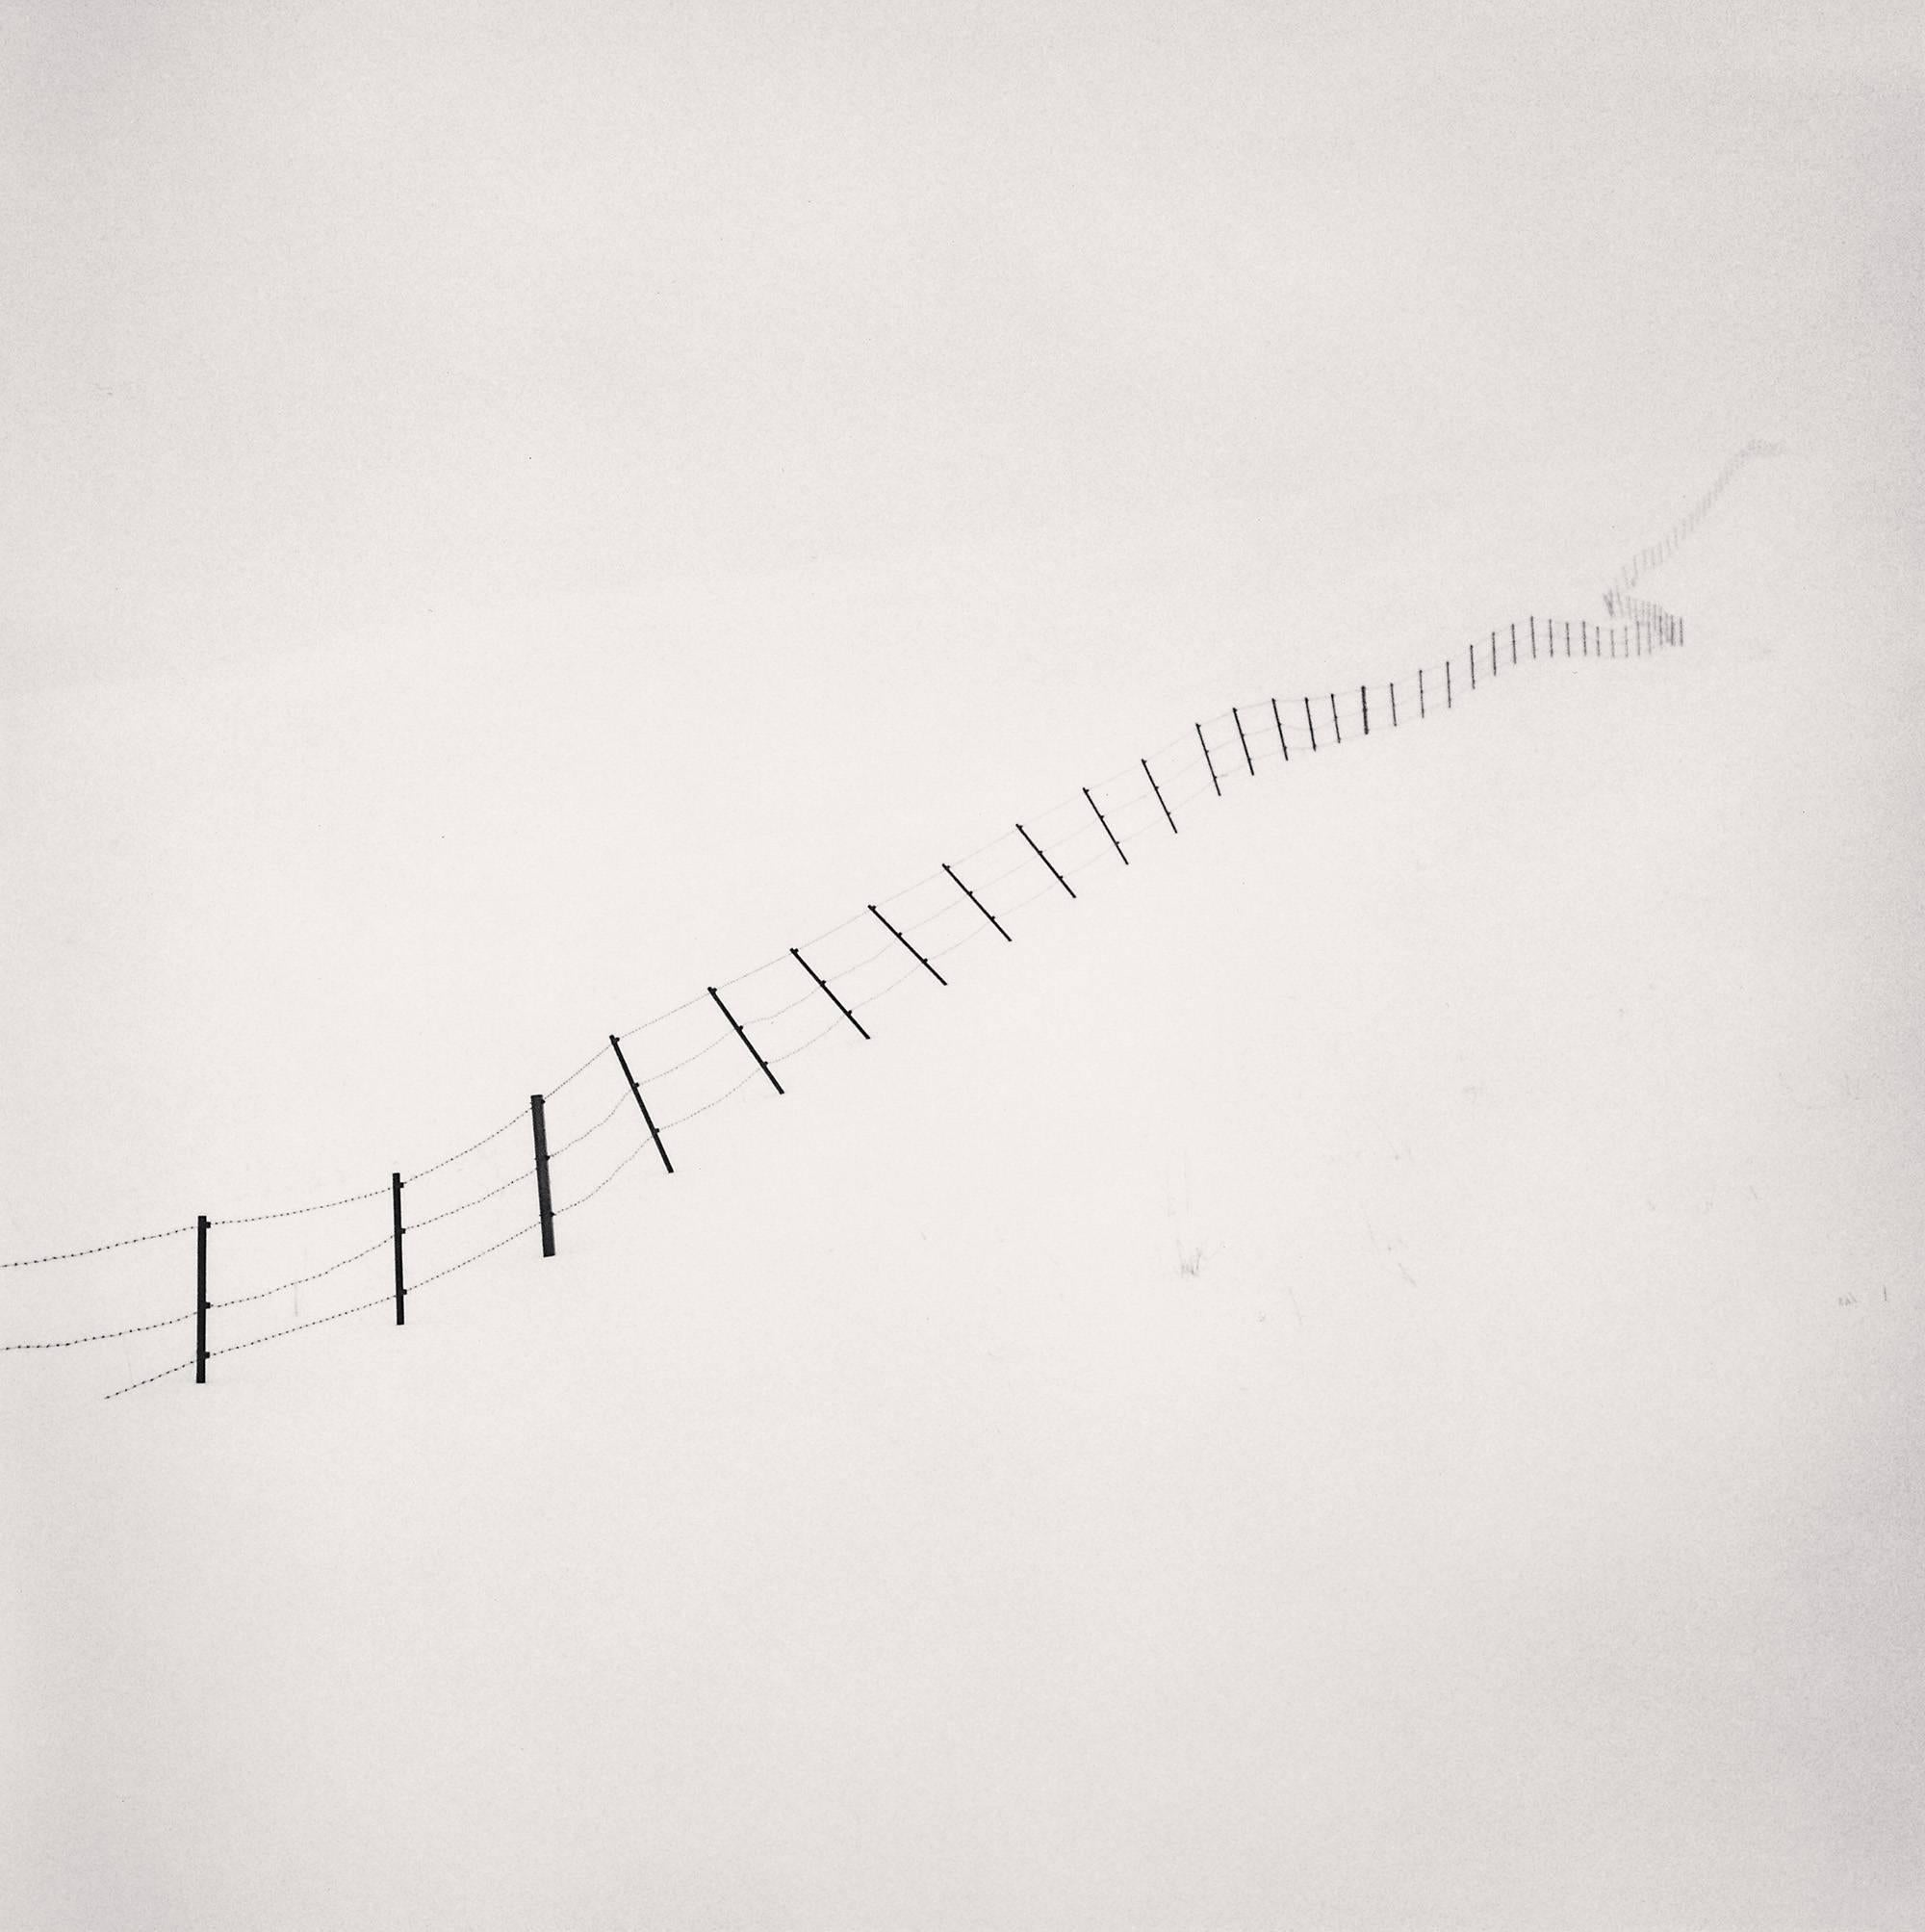 Hillside Fence, Study 4, Teshikaga, Hokkaido, Japan. 2002